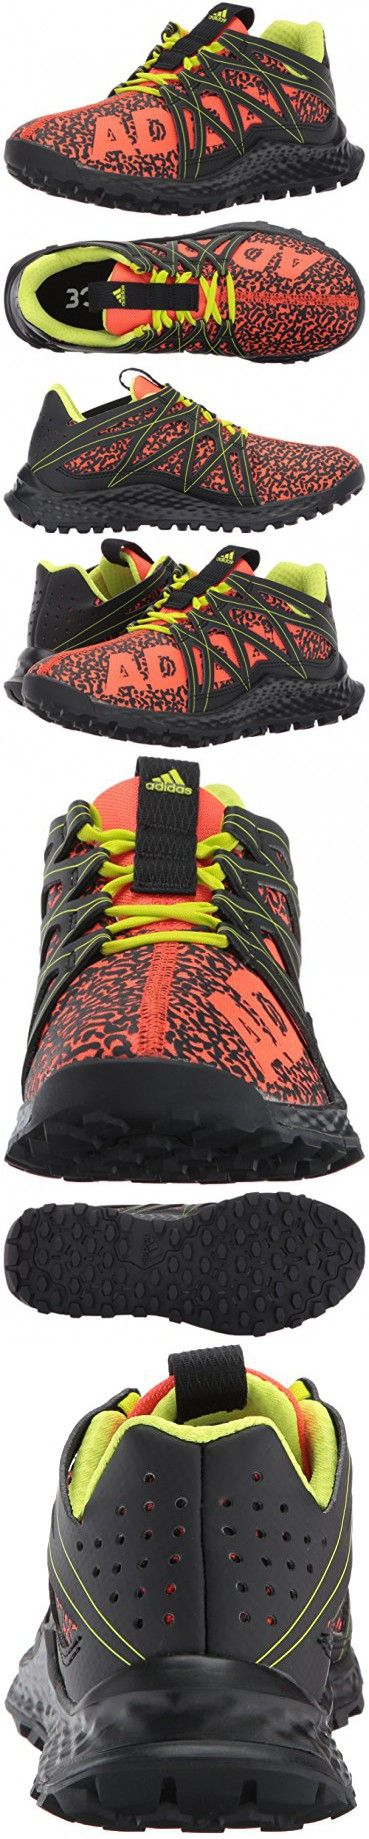 78b6843cd7323 Adidas Performance Boys  Vigor Bounce j Running Shoe